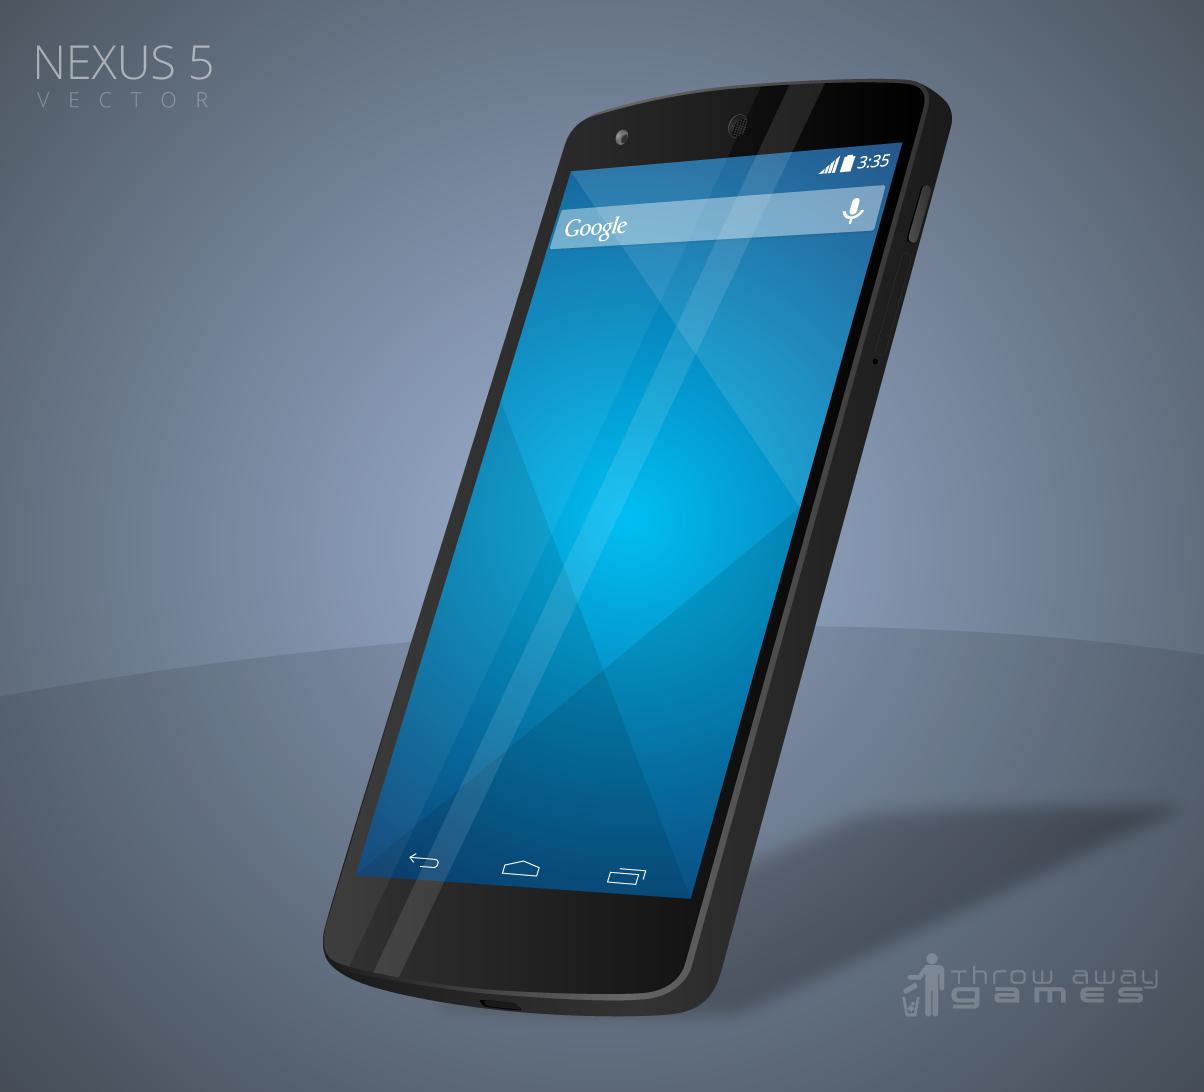 Free Nexus 5 Vector: Downloadable AI by walcor